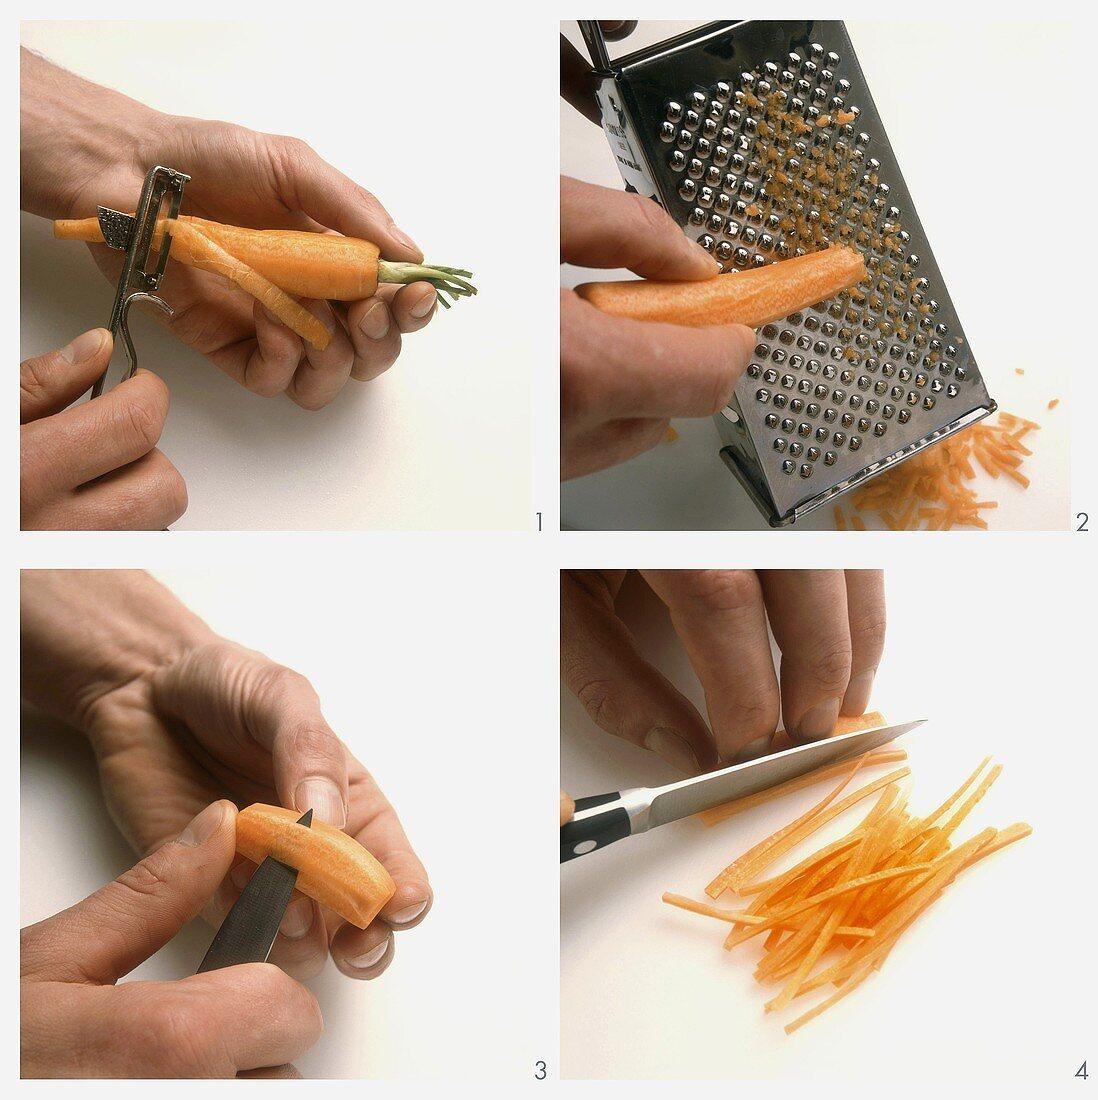 Peeling, grating, turning or chopping carrots